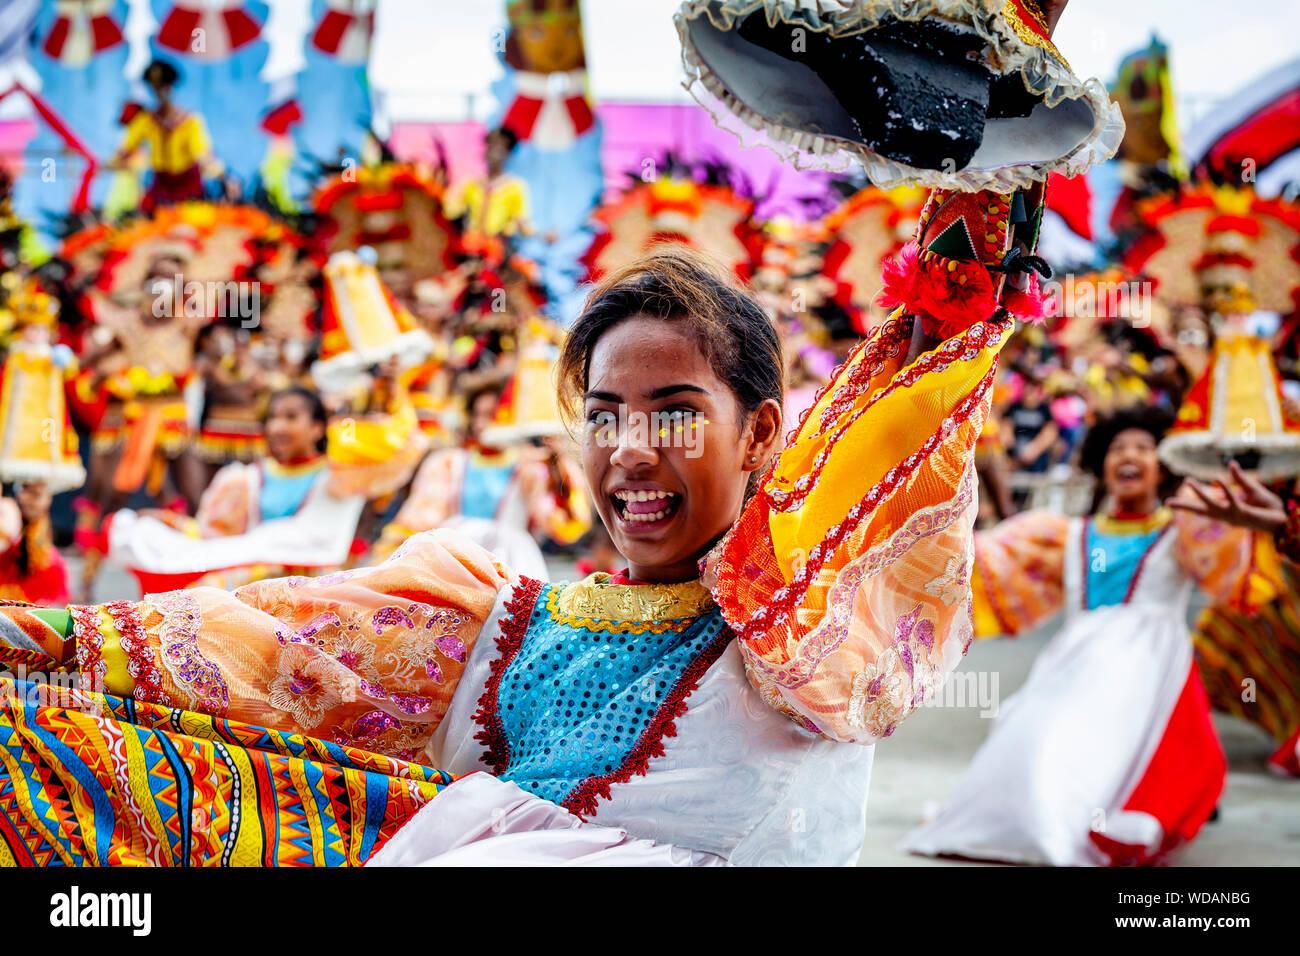 Filipino Festivals Stock Photos & Filipino Festivals Stock